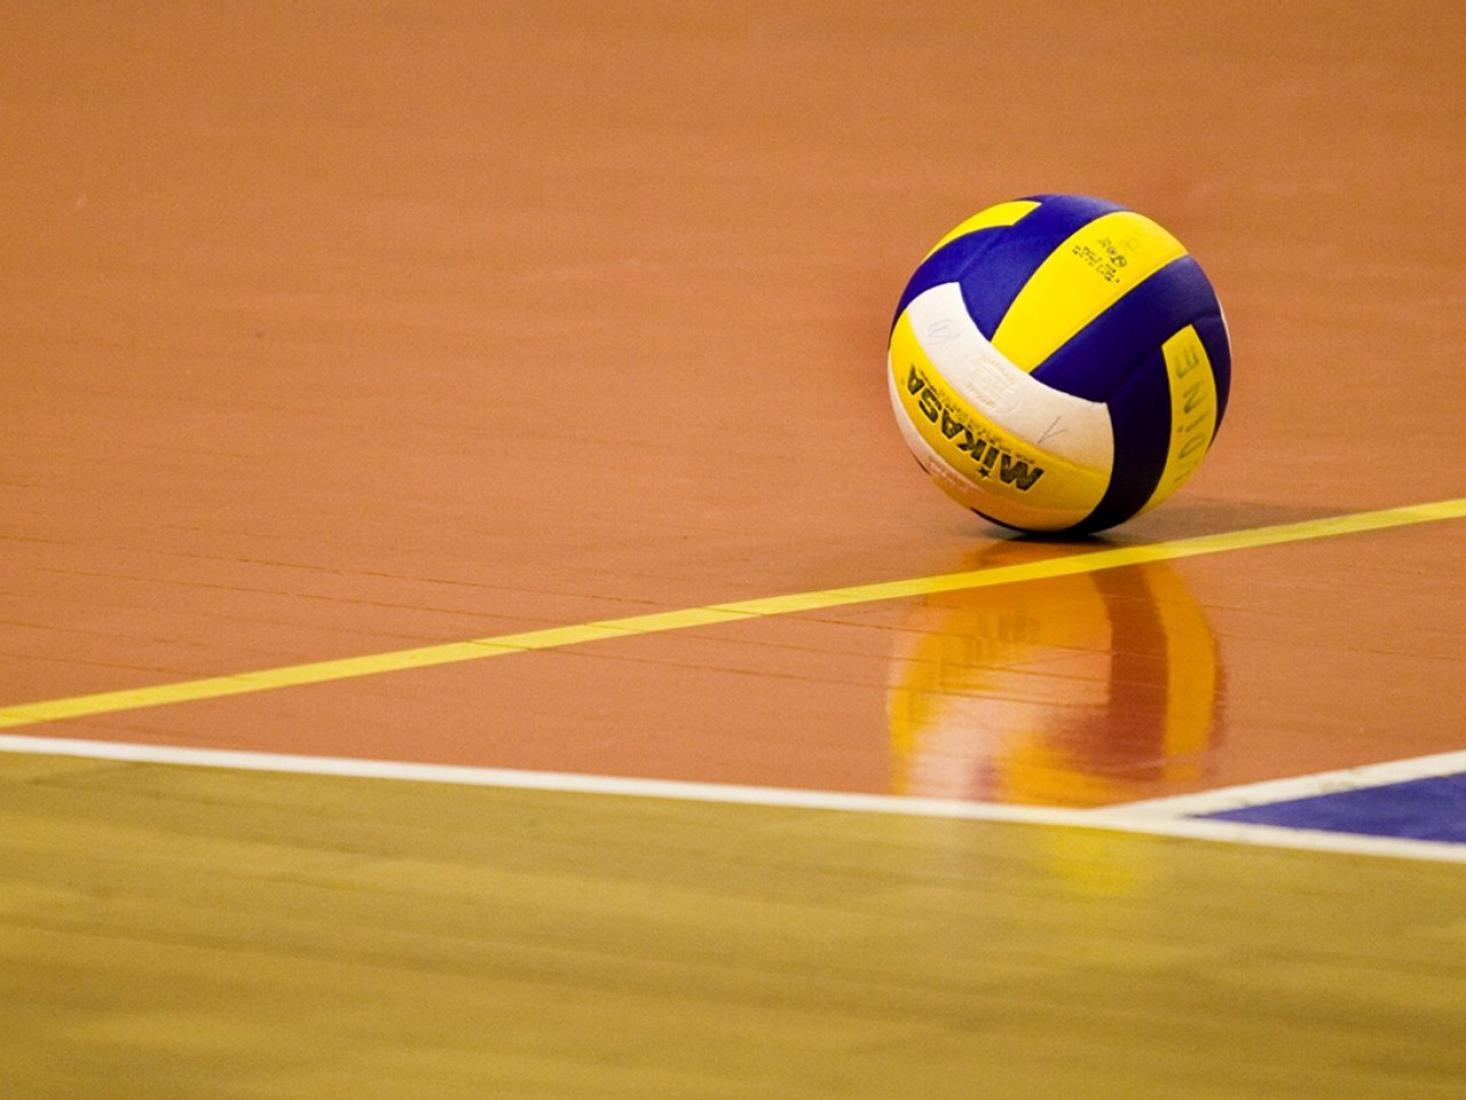 Volley - Mondial 2018 : La Tunisie ce mercredi face au Cameroun